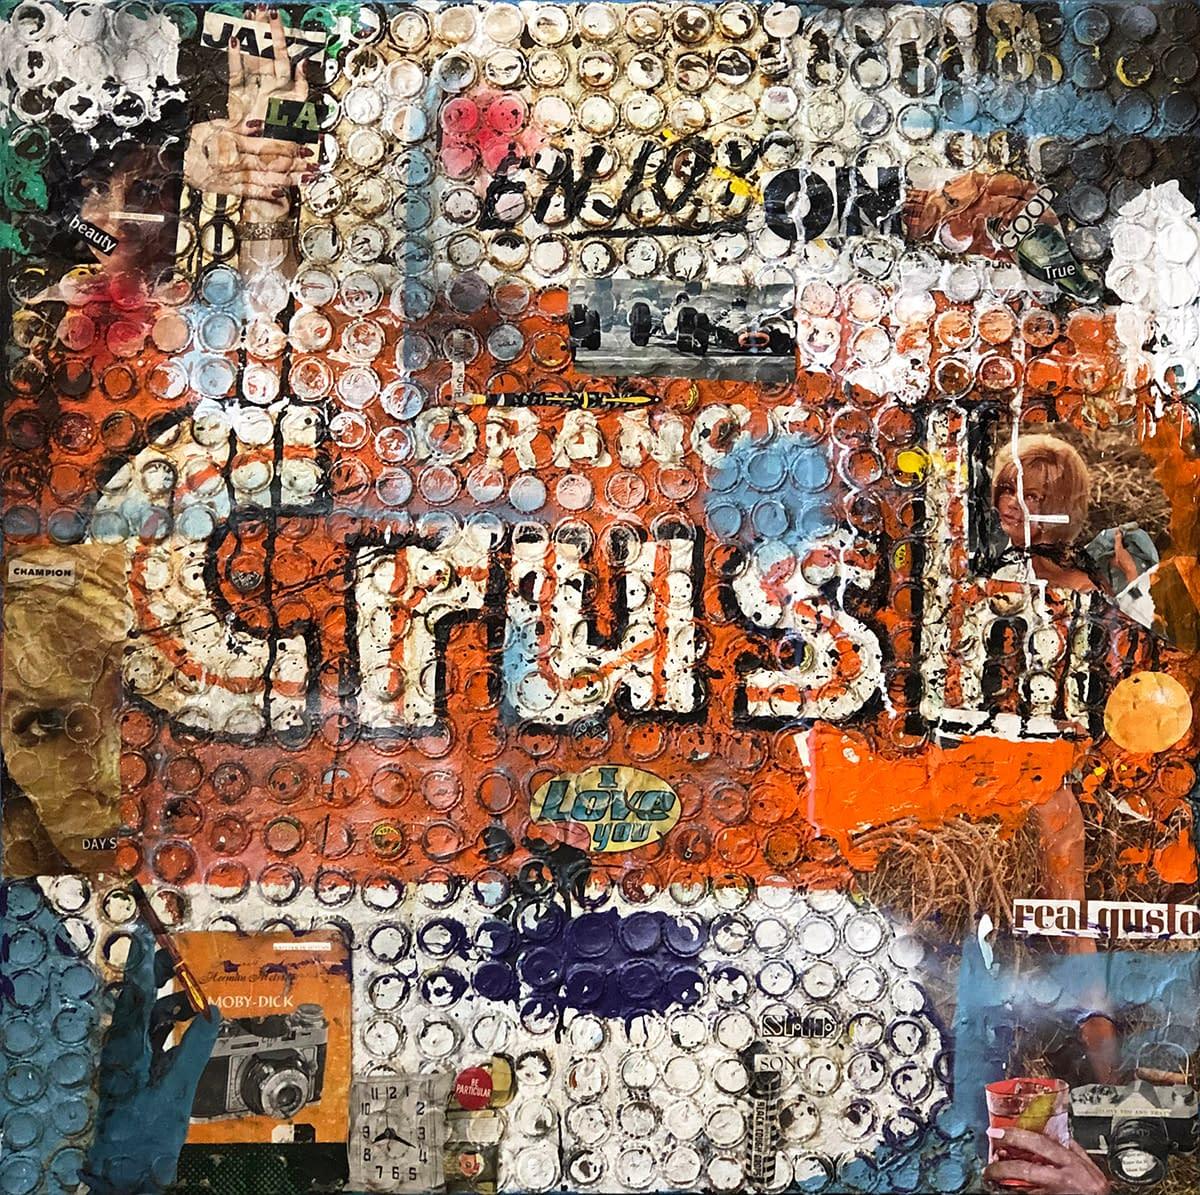 Orange_Crush_Greg_Miller_Acrylic_Paint_Collage_Bottle_Cap_on_Panel_36_x_36